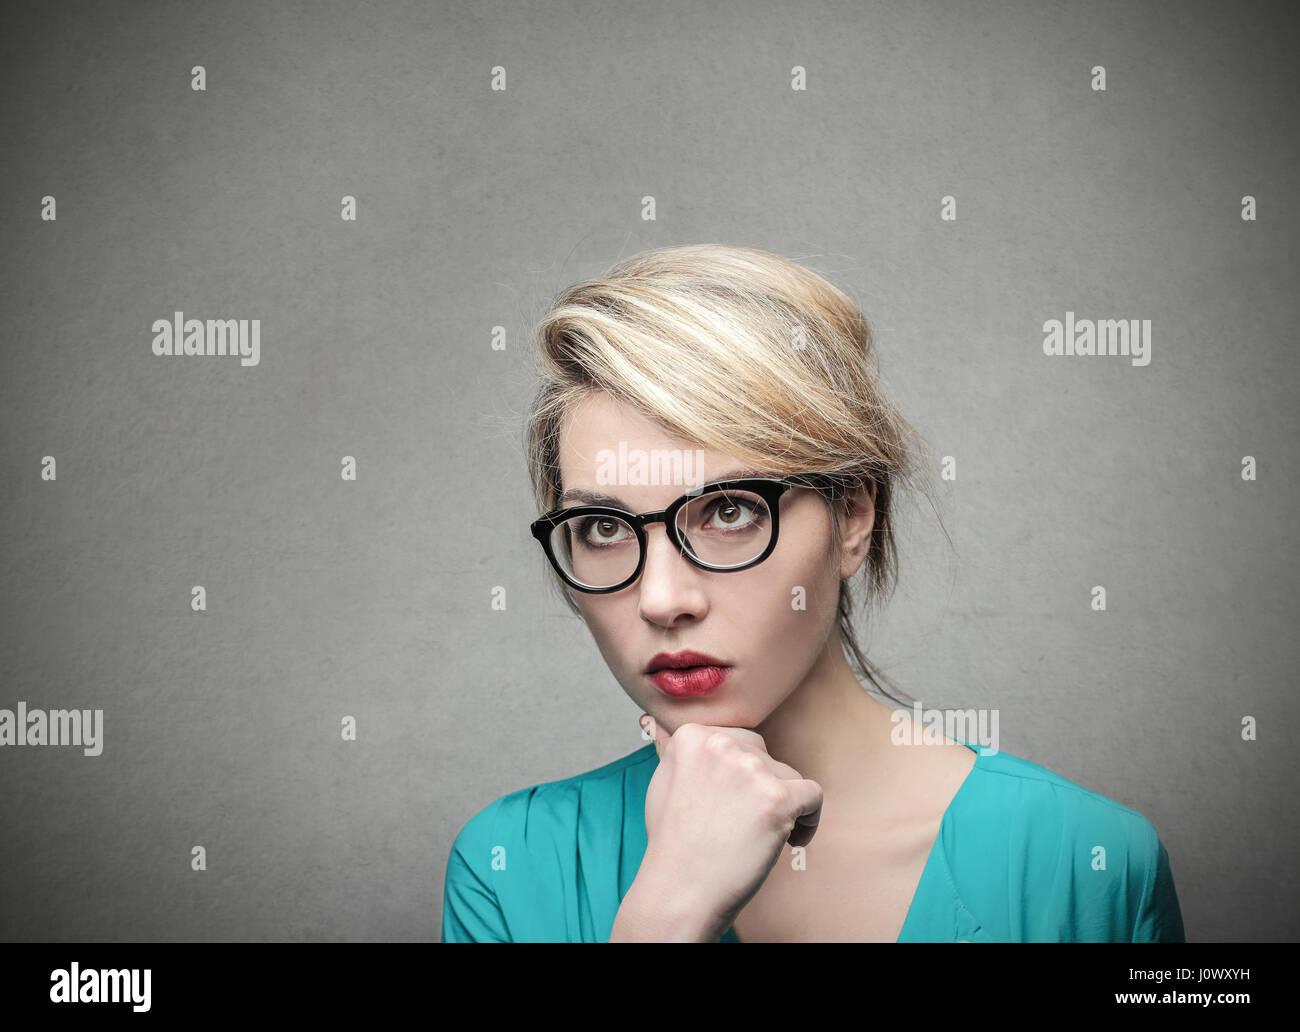 Mujer rubia de gafas pensando Imagen De Stock